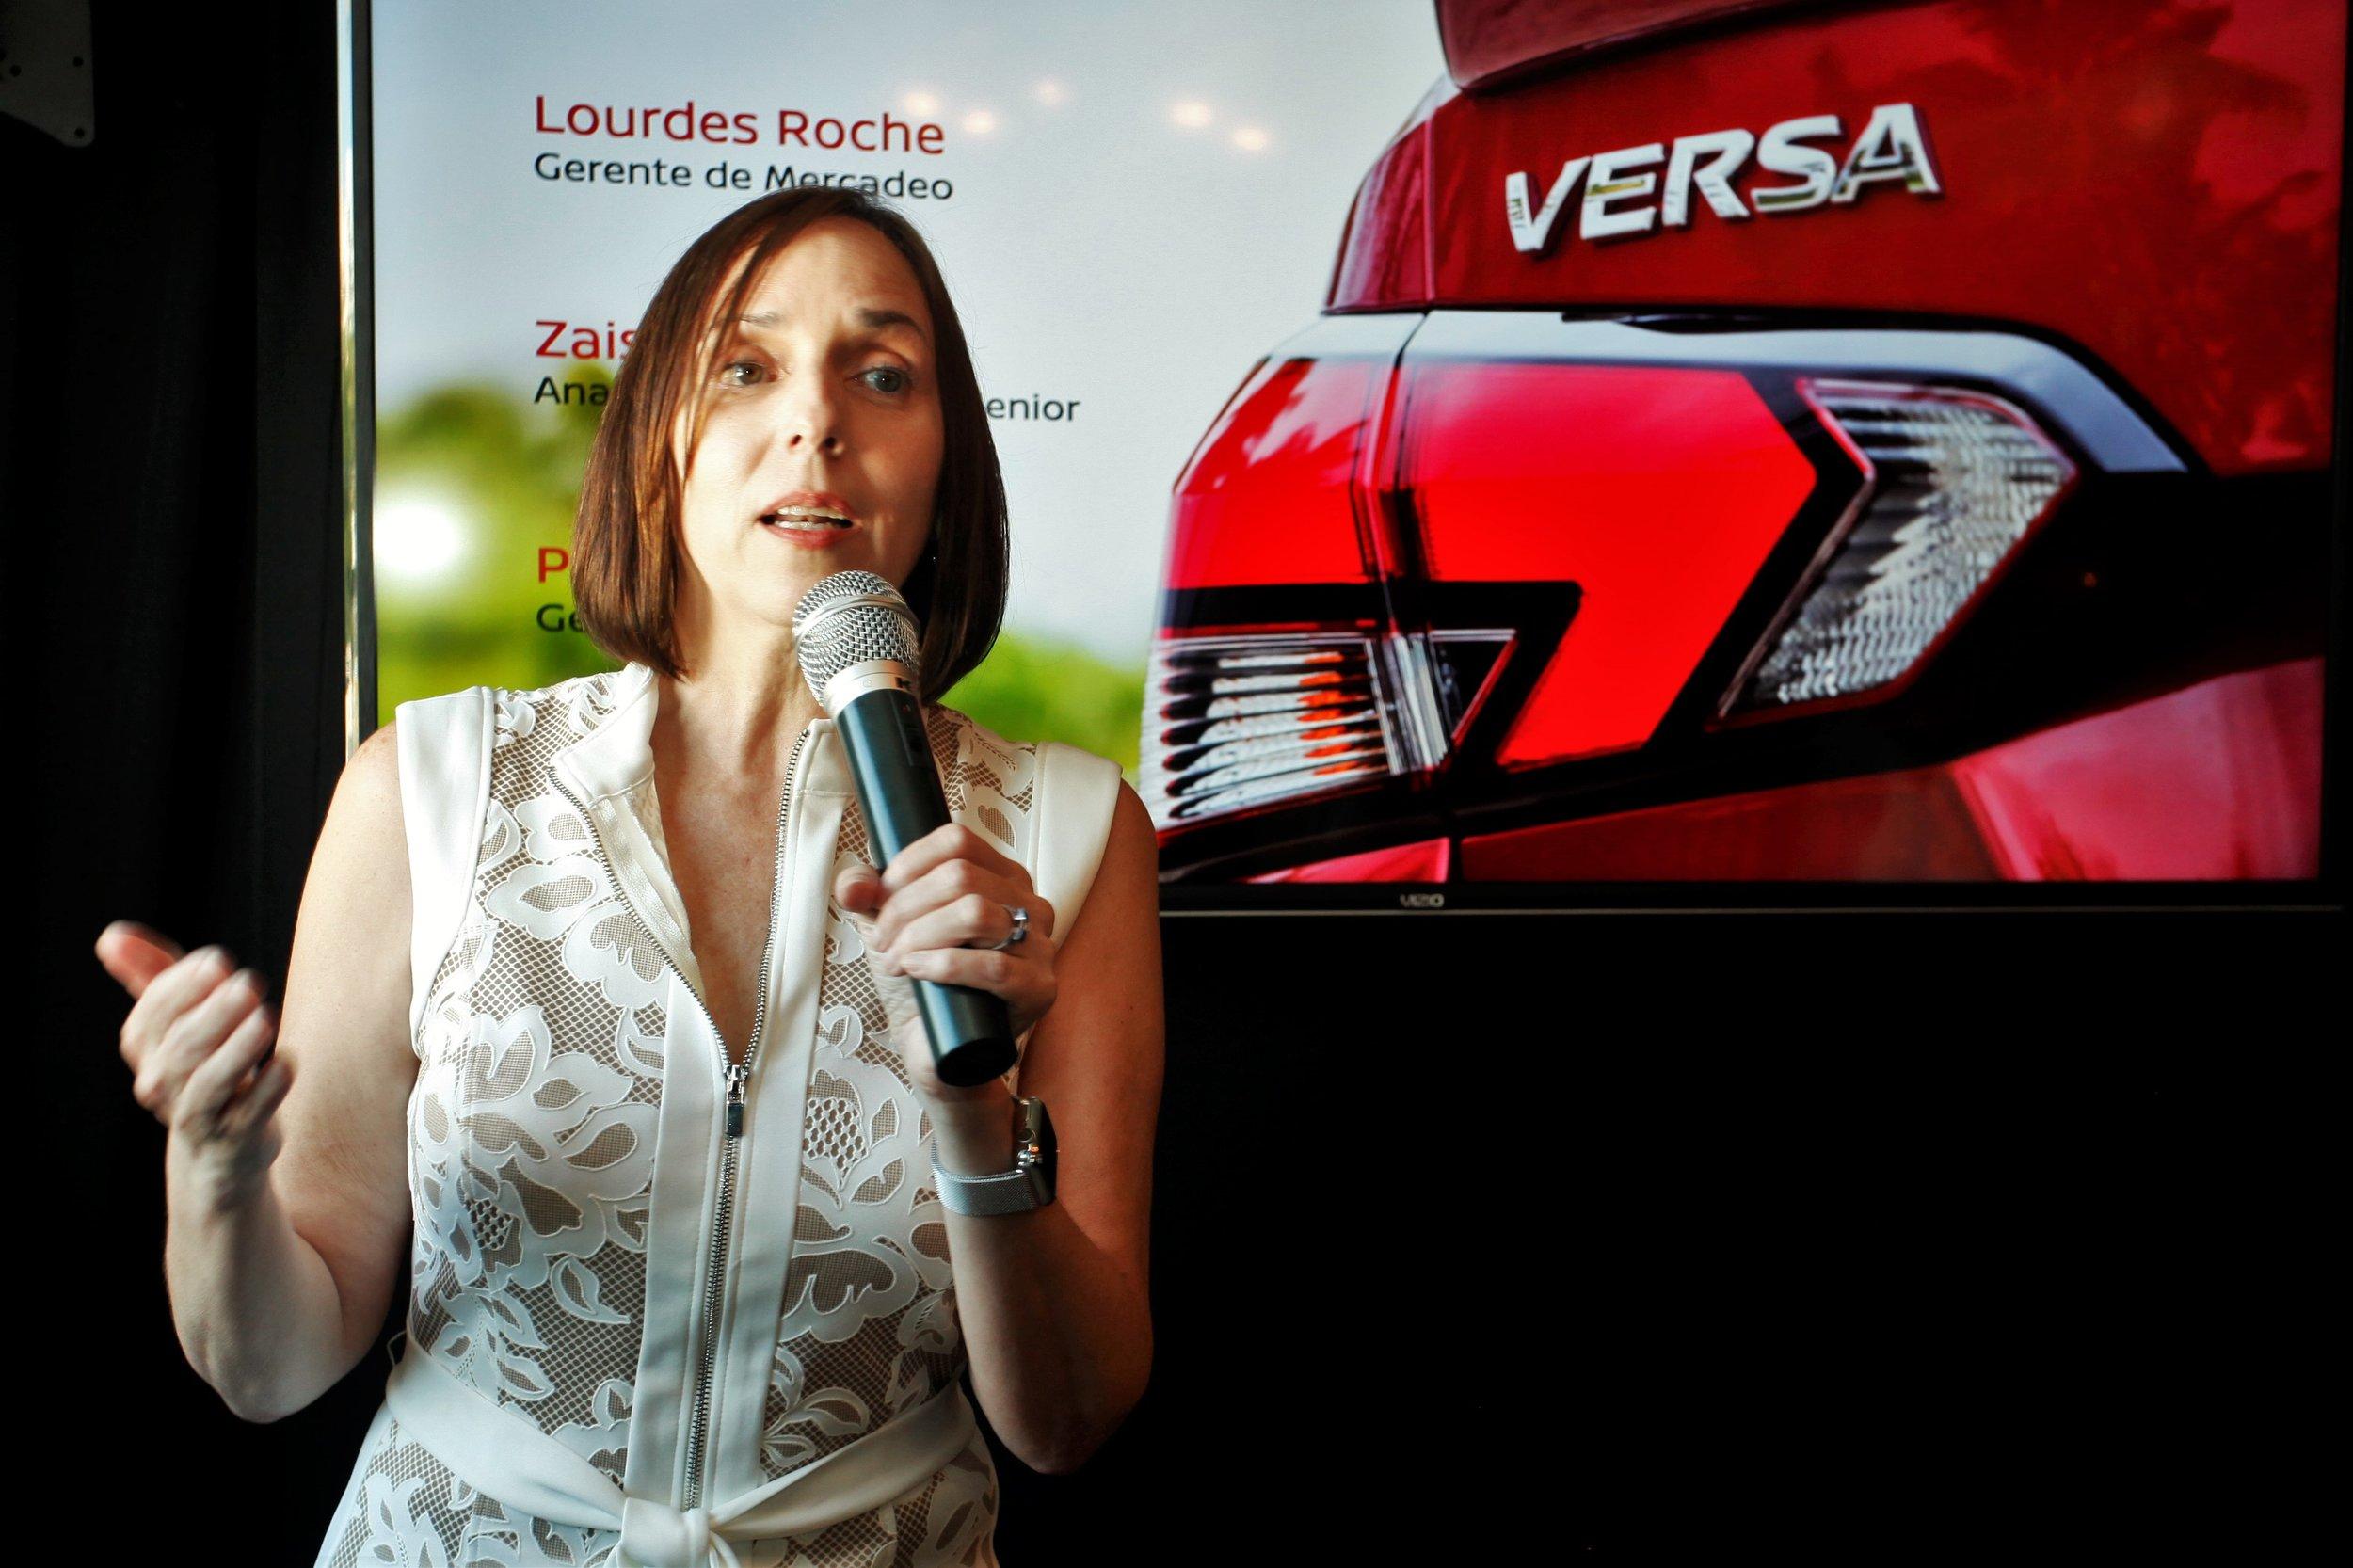 _MG_4105 Lourdes Roche gerente de Mercadeo Nissan PR.JPG